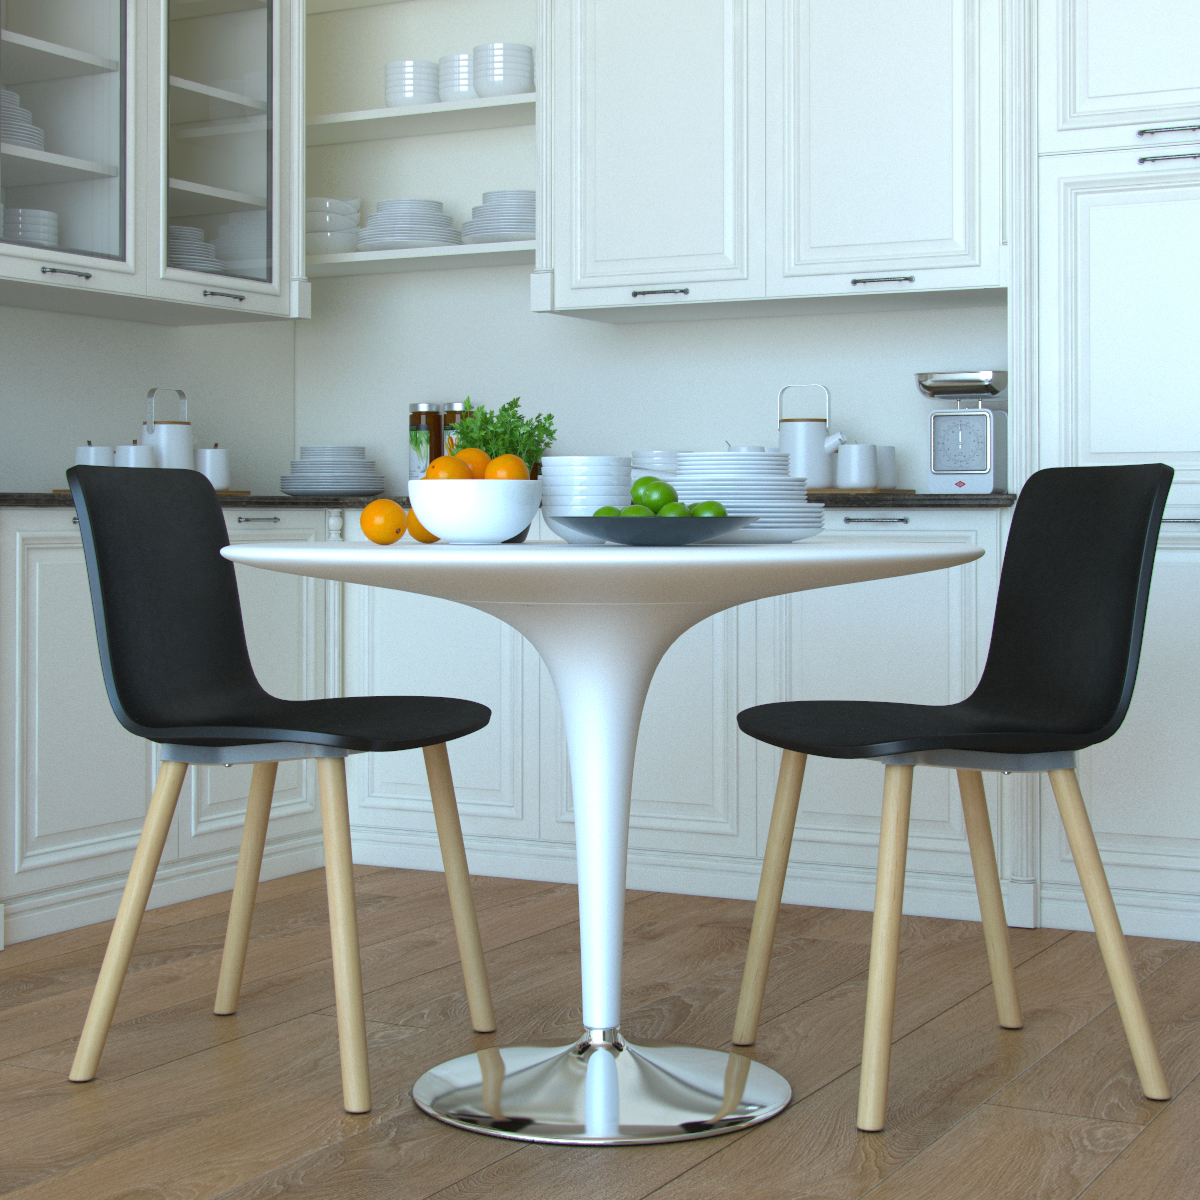 Studio Plastic Modern Dining Chair In Black